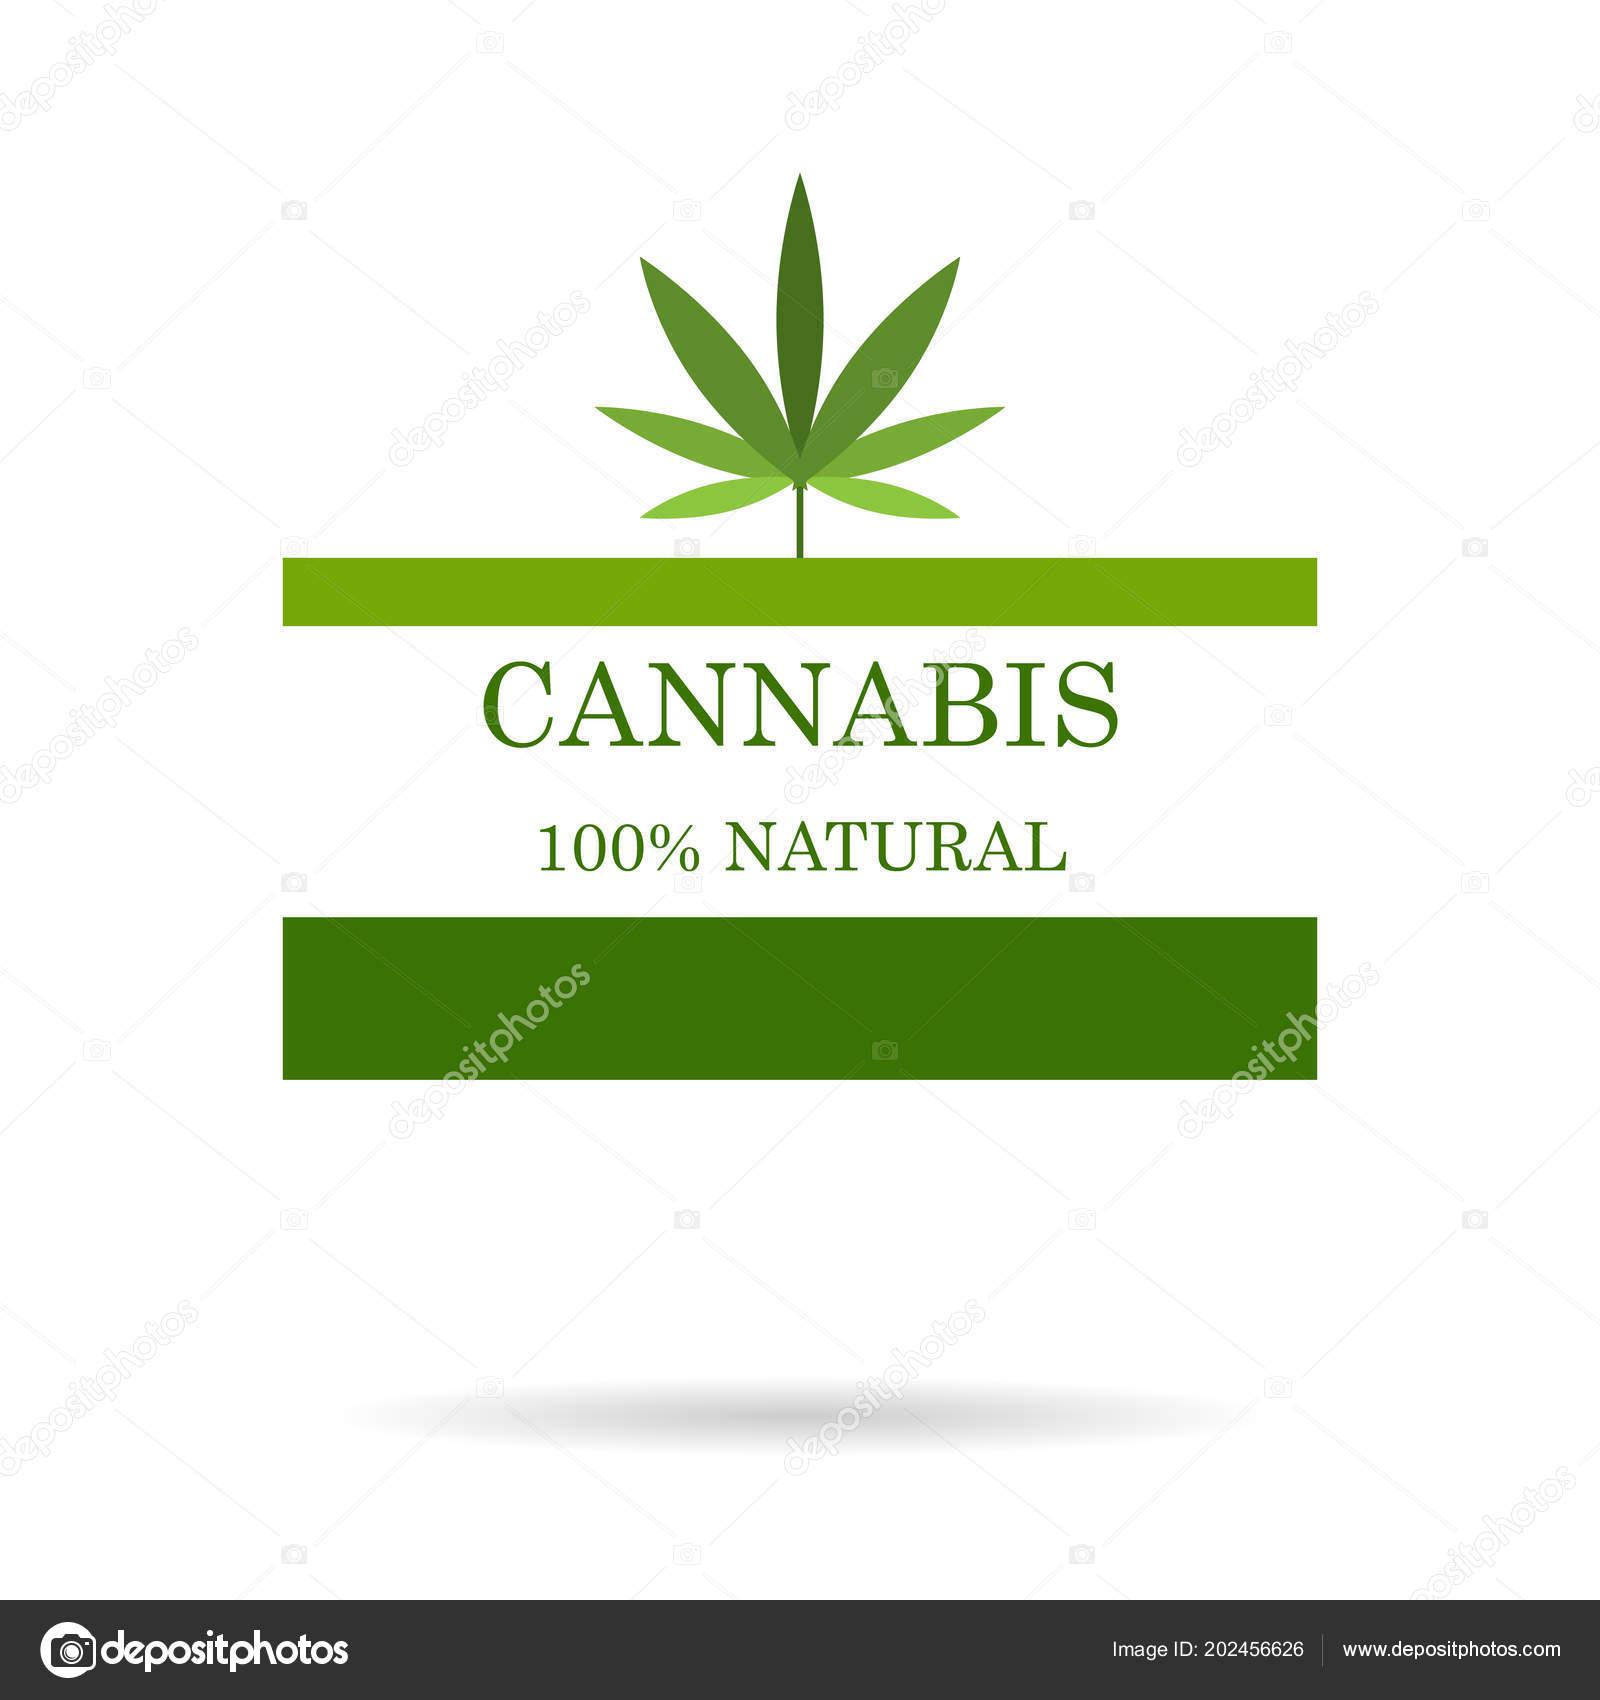 c5107ce87398 Φύλλο μαριχουάνα. Ιατρική κάνναβη. Λάδι κάνναβης. Φυσικό κάνναβης. Εικόνα  προϊόντος ετικέτα και